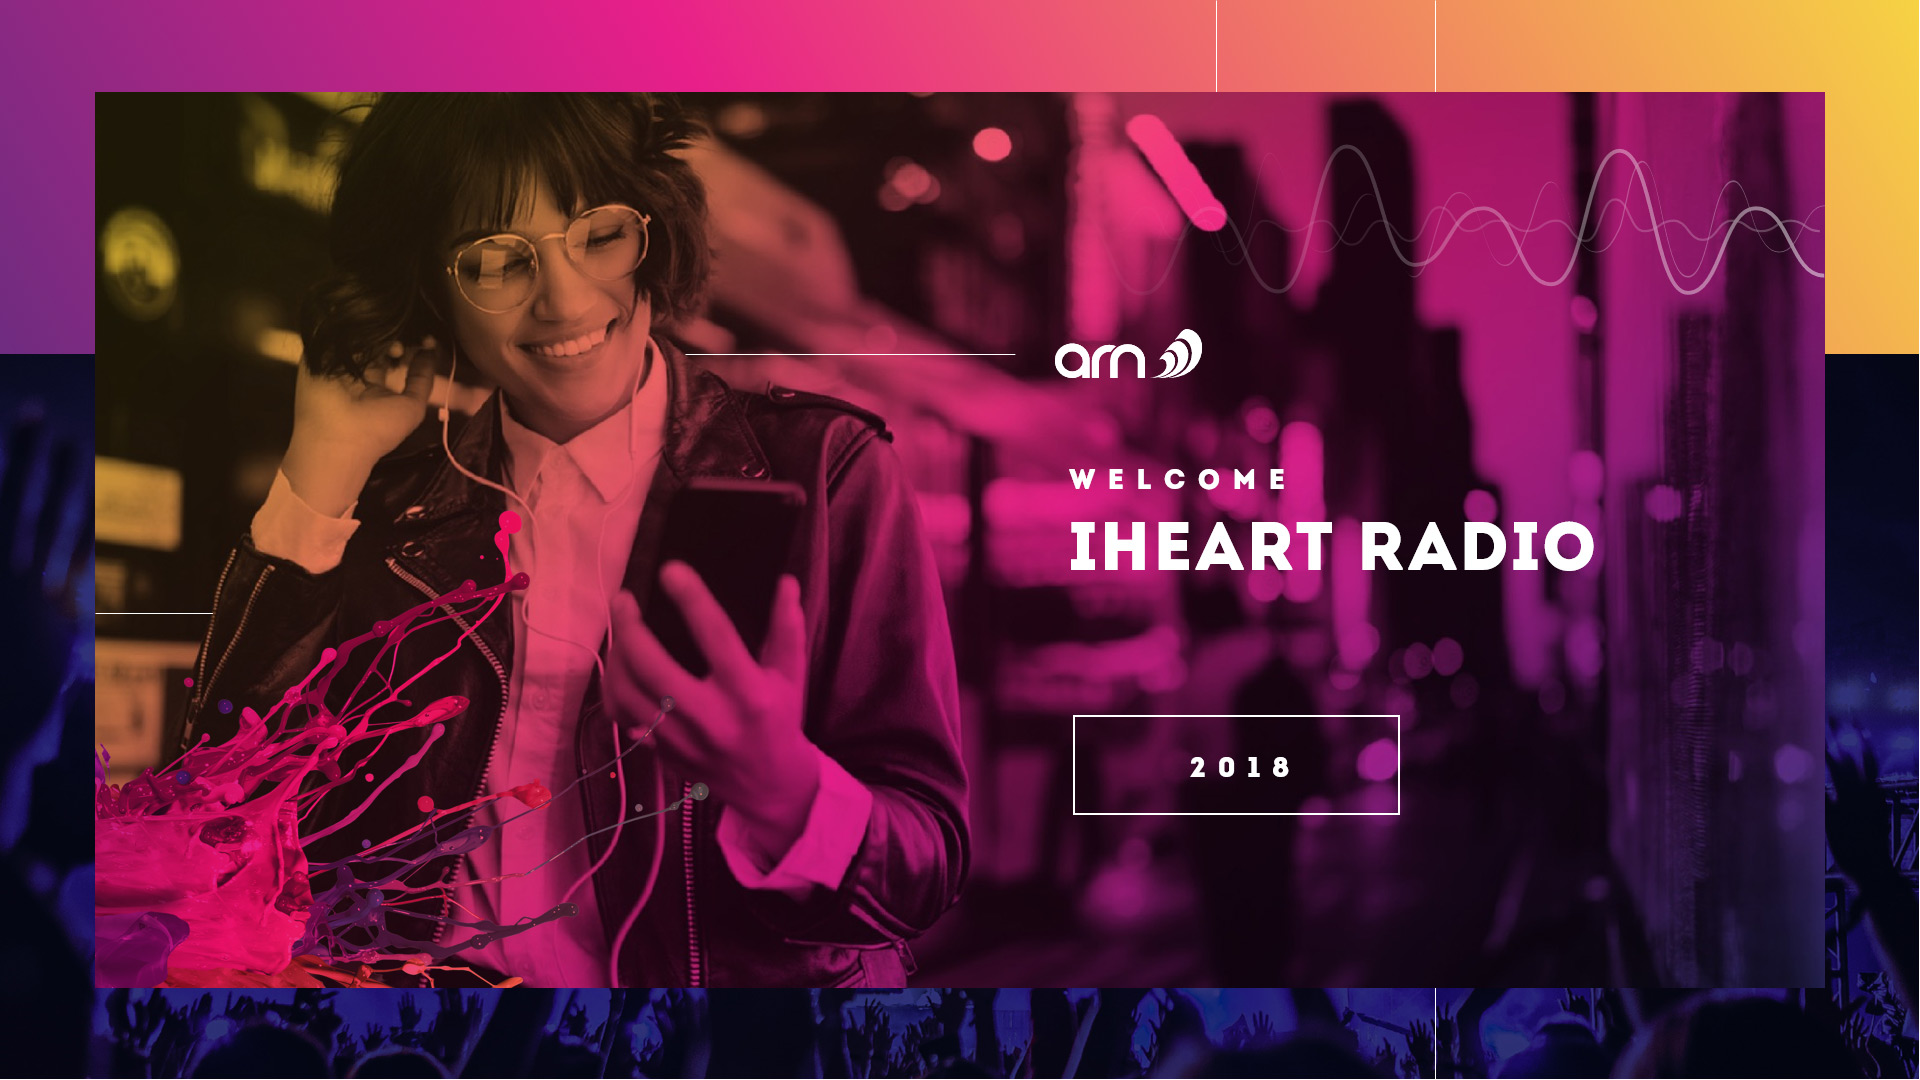 ARN iHeart Radio